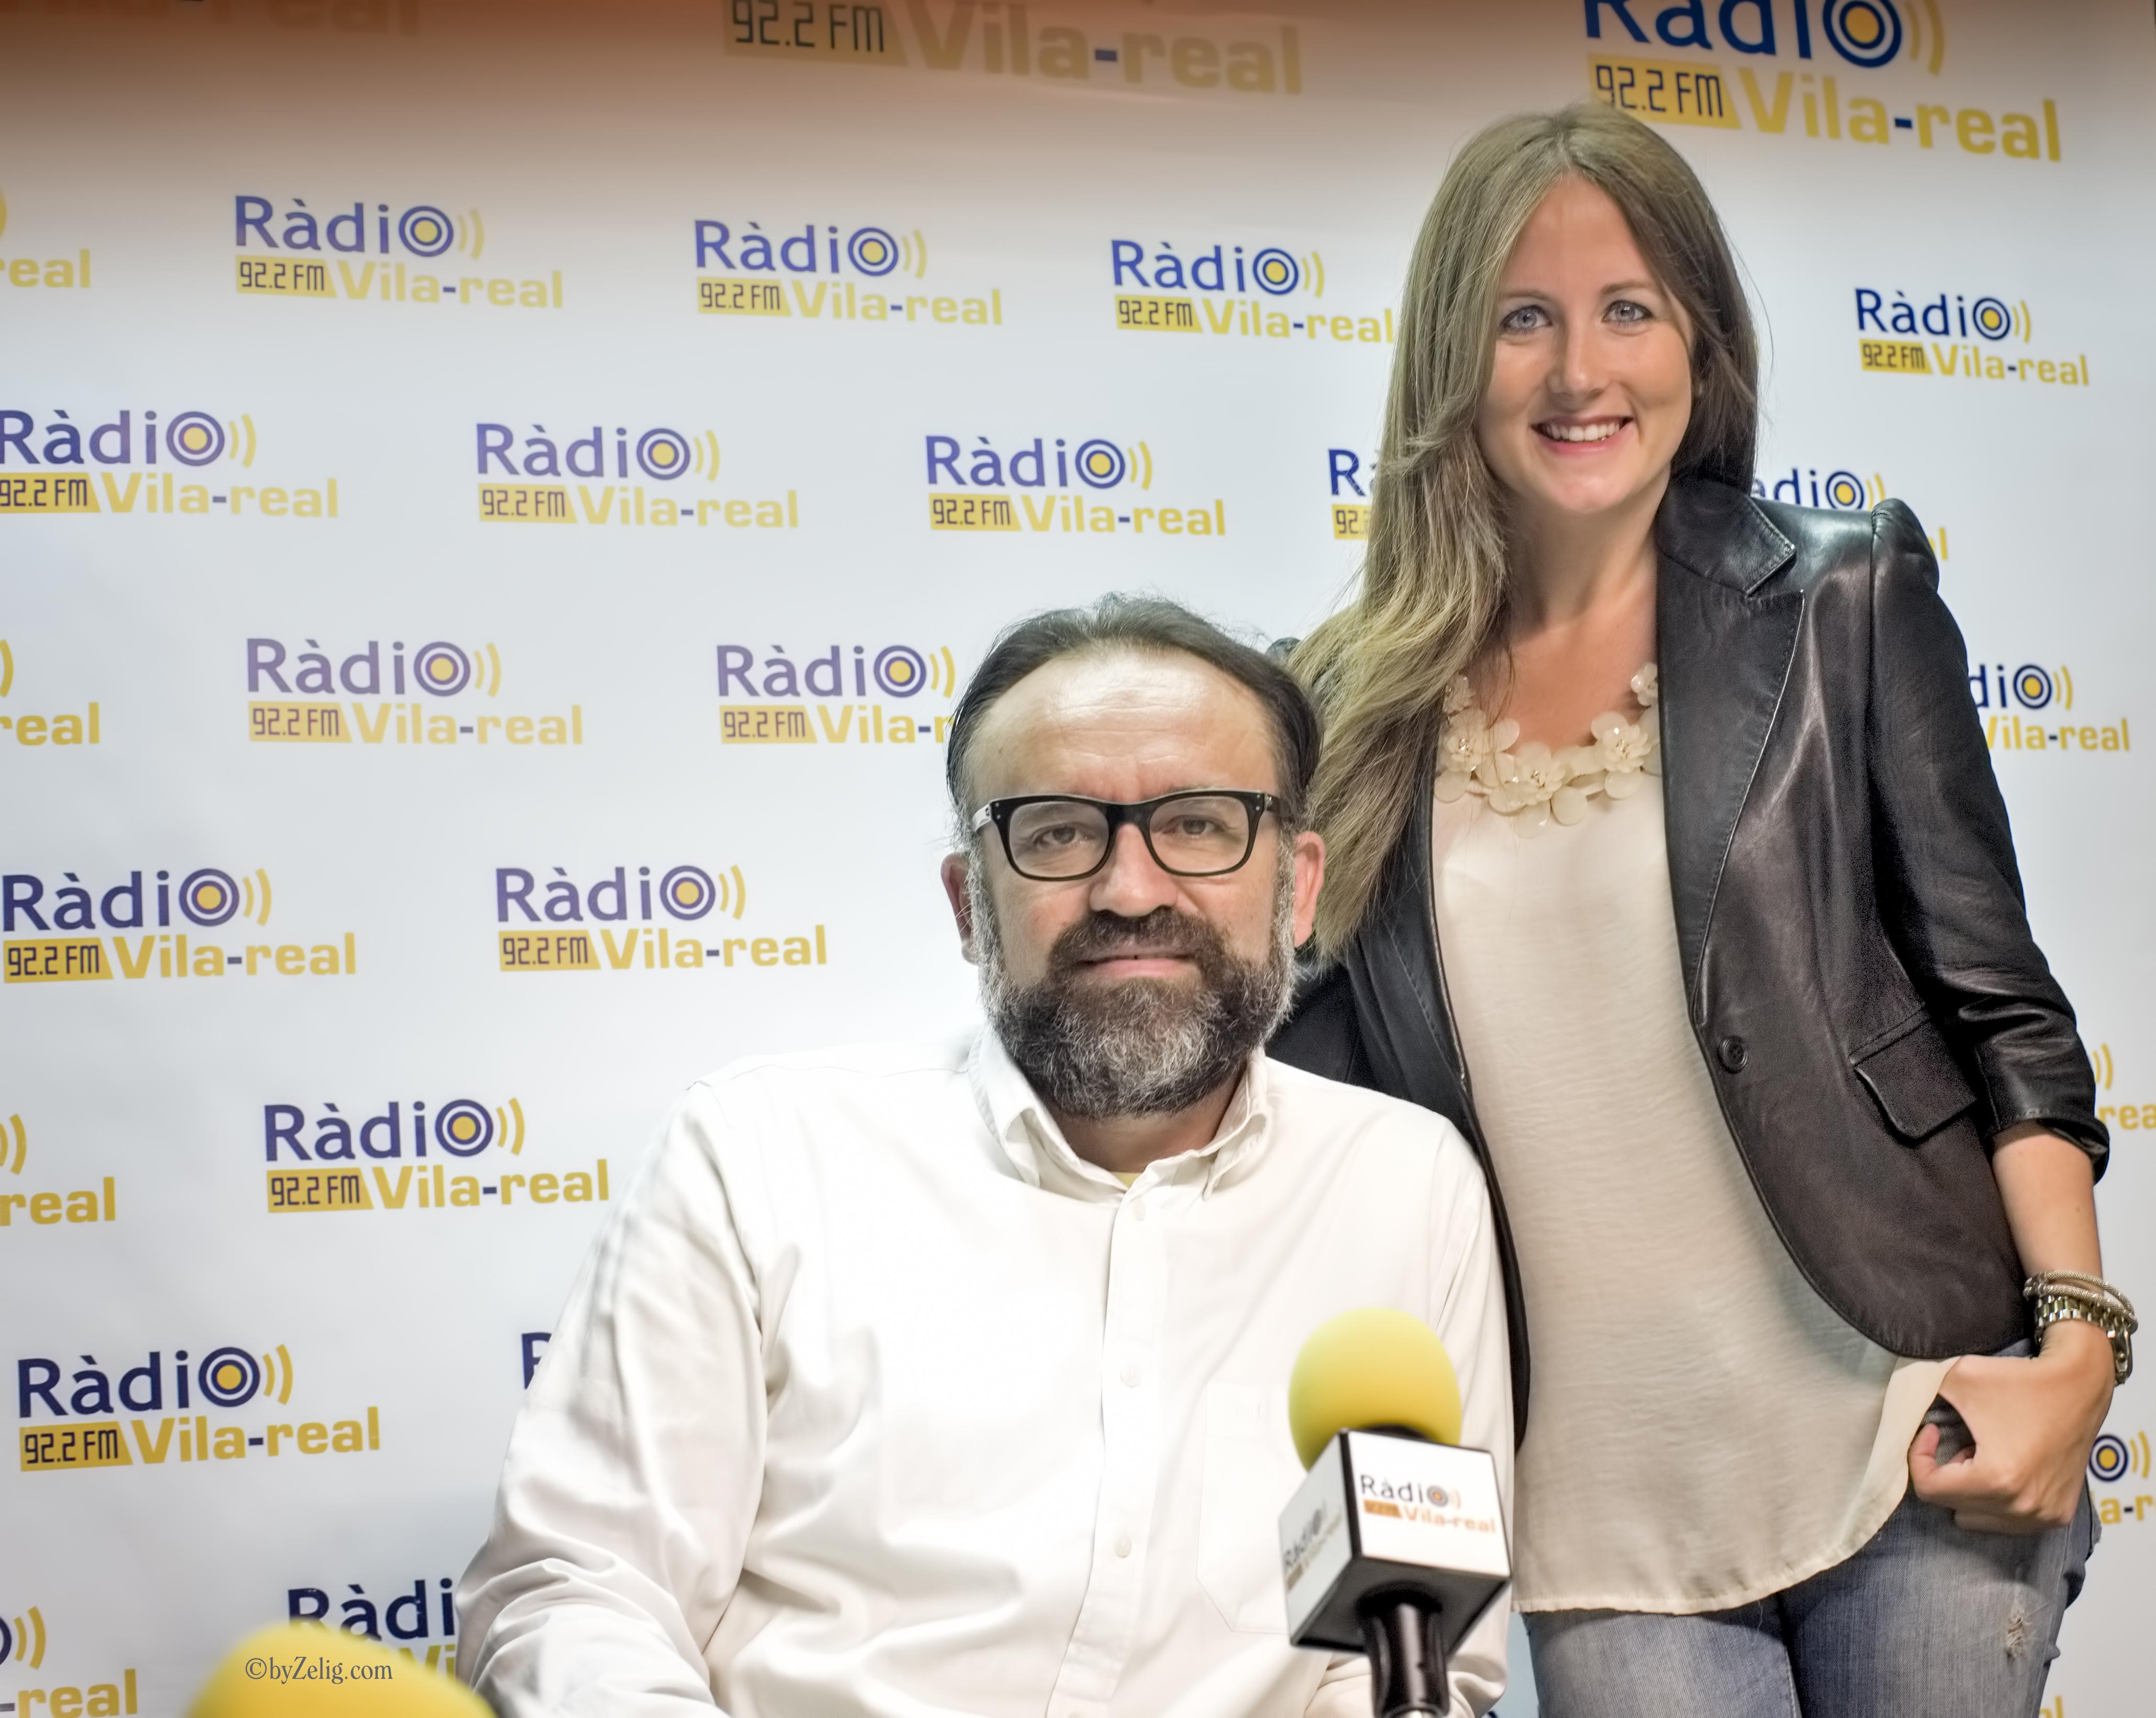 Esports Radio Vila-real. Programa del 9 de febrero 2018